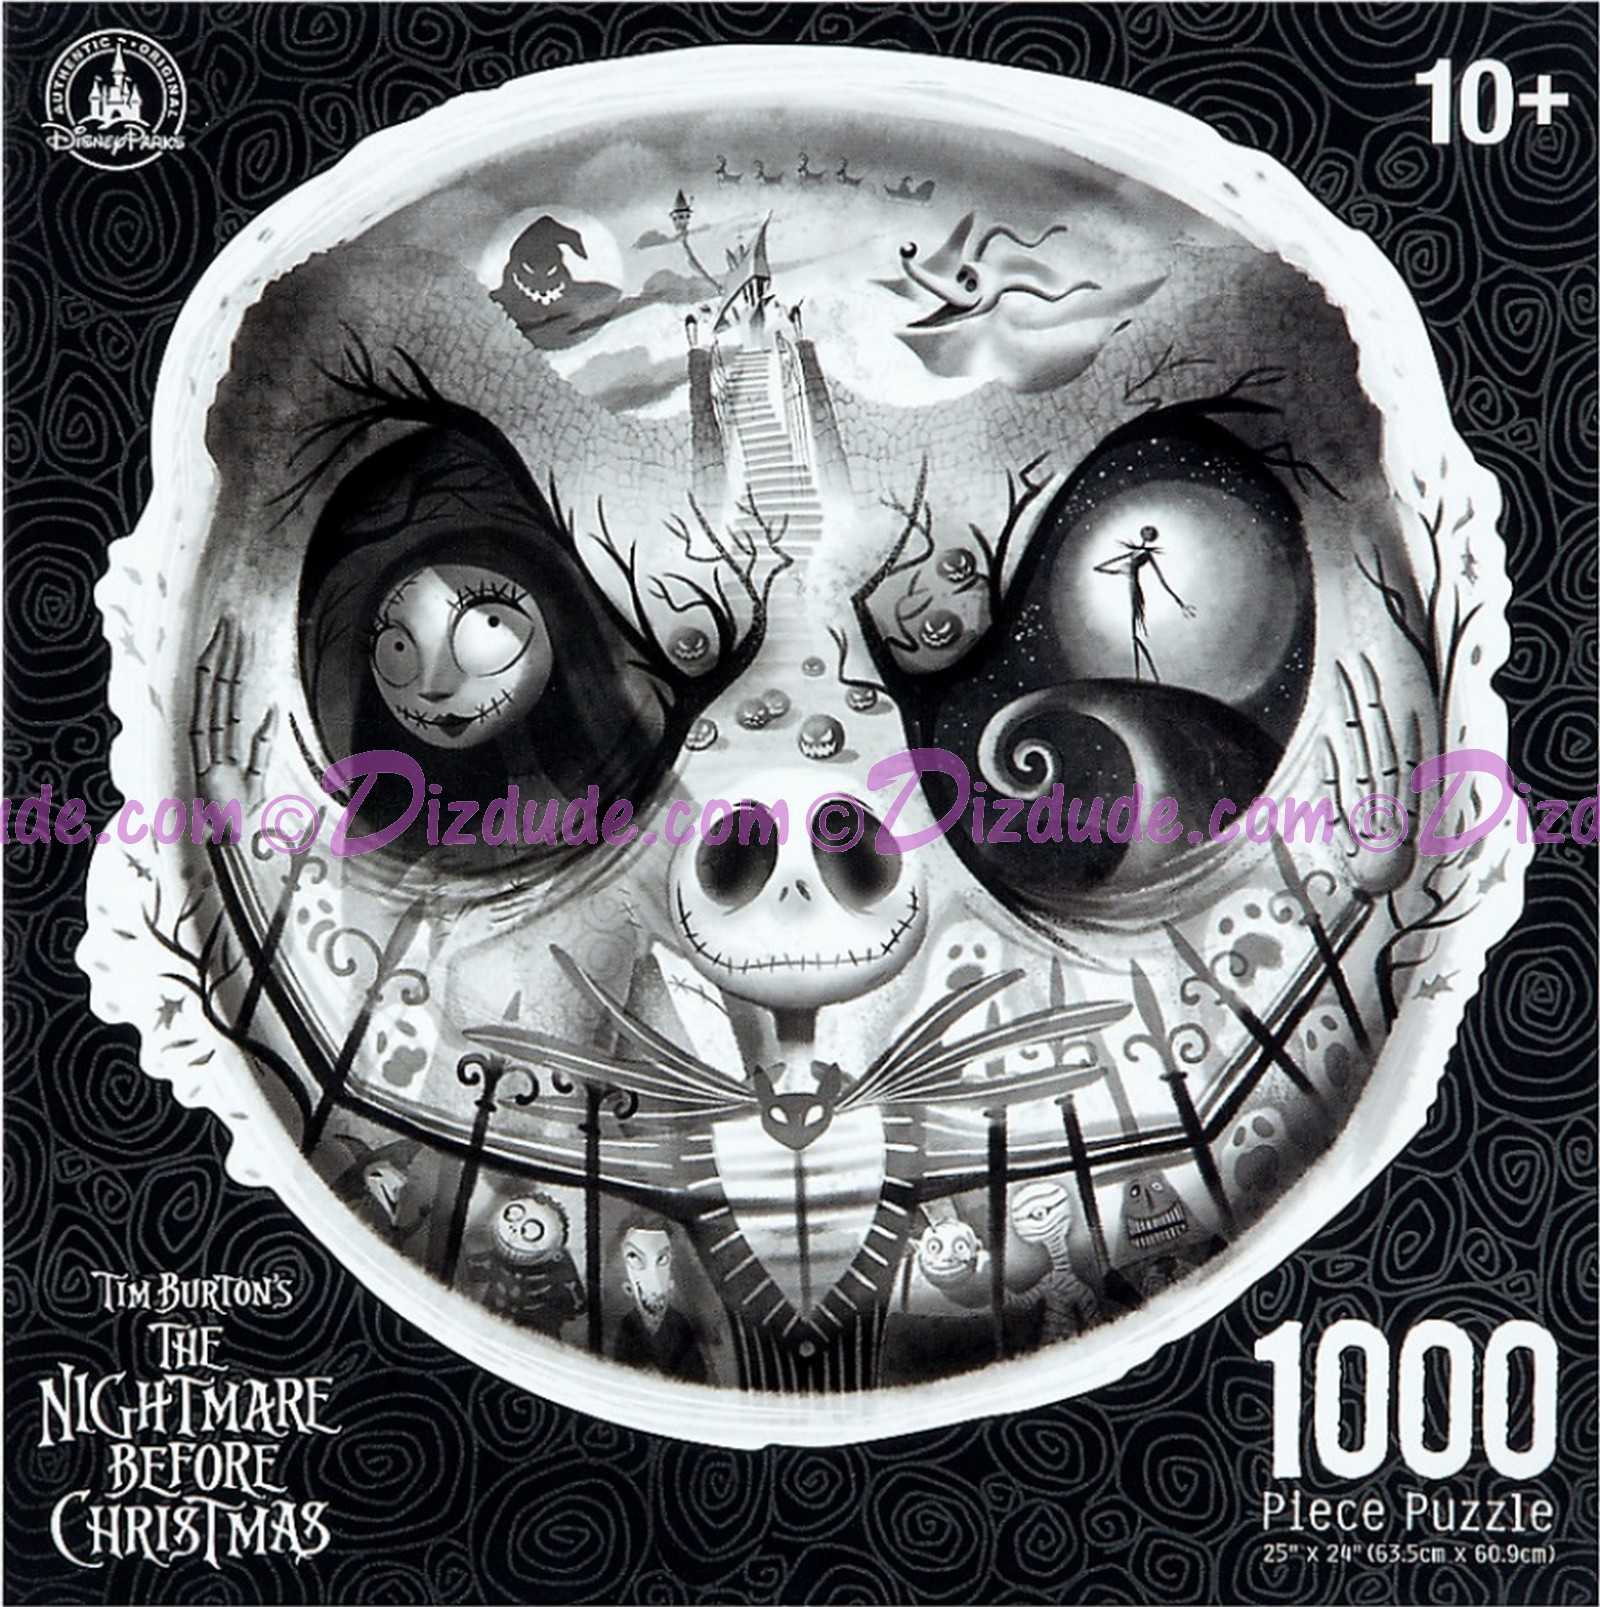 DIZDUDE.com | Tim Burtons The Nightmare Before Christmas 1000 Piece ...